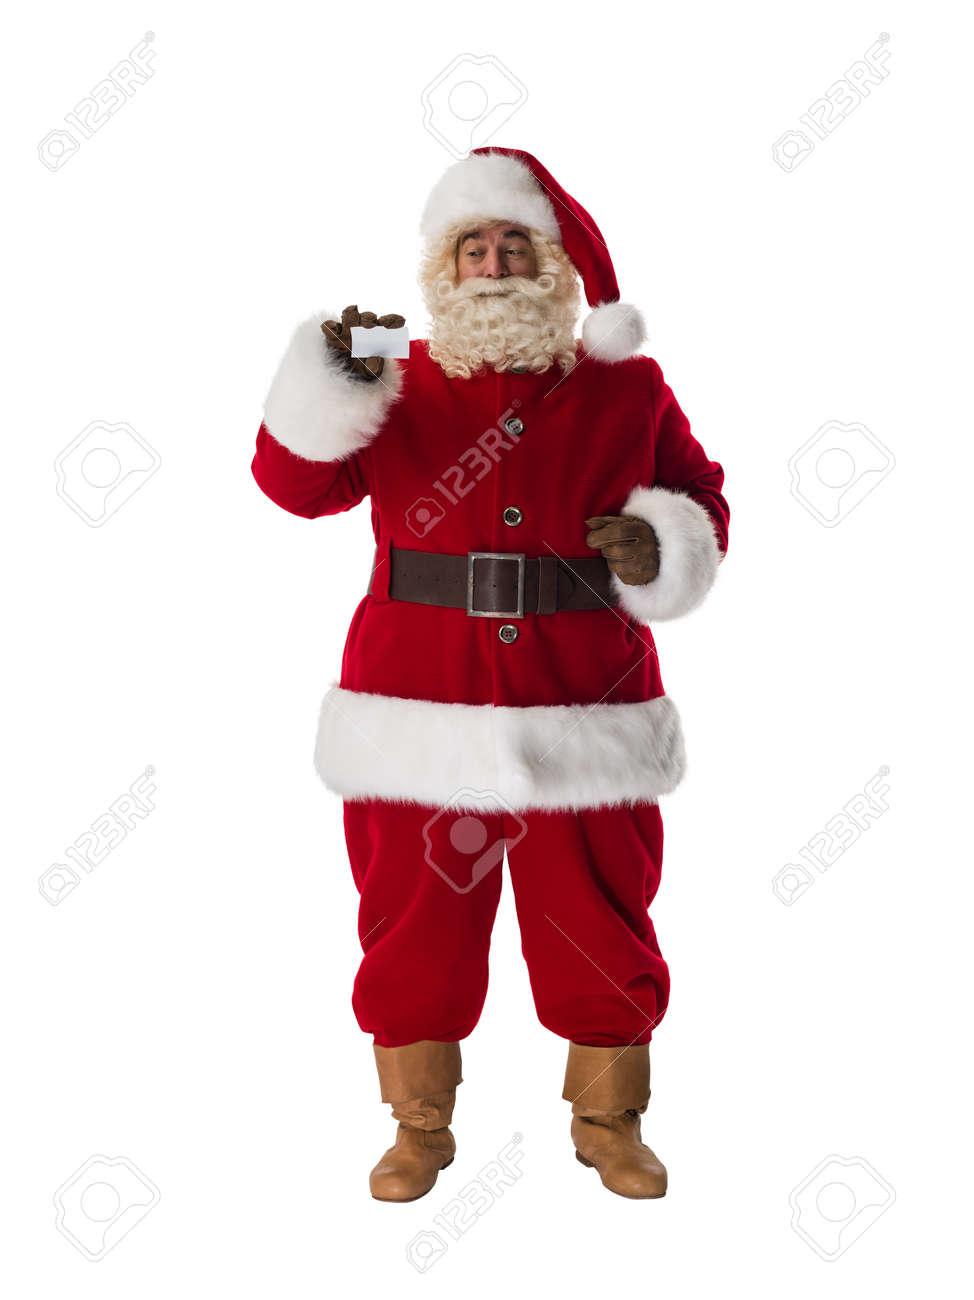 Santa Claus Holding Business Card Full-Length Portrait Stock Photo ...